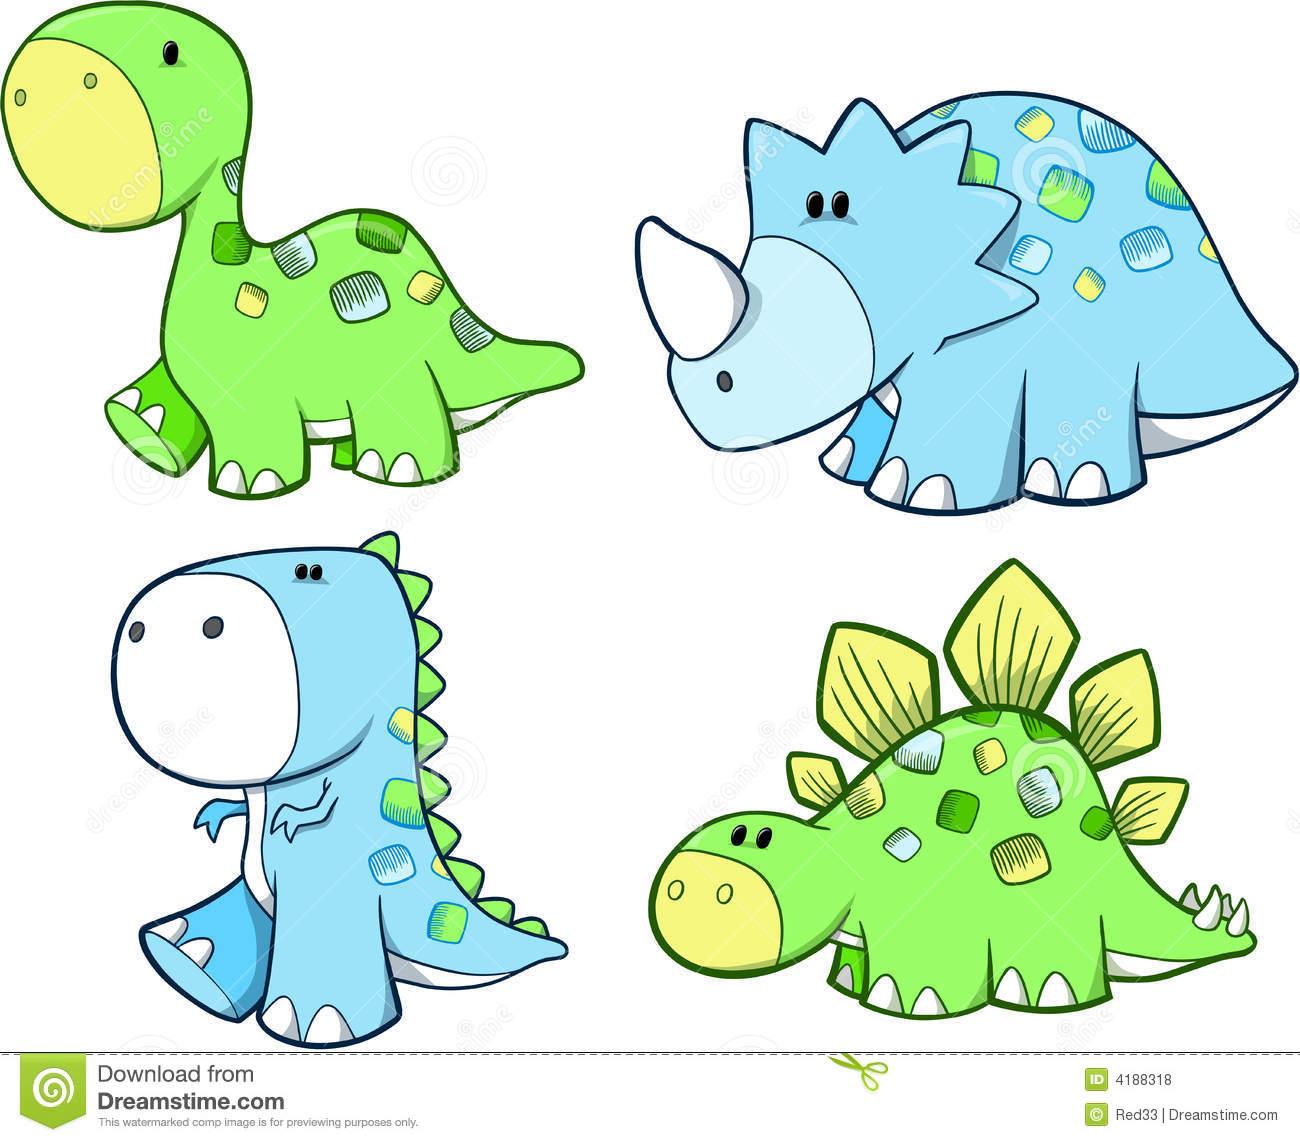 47+] Cute Dinosaur Wallpaper on WallpaperSafari.